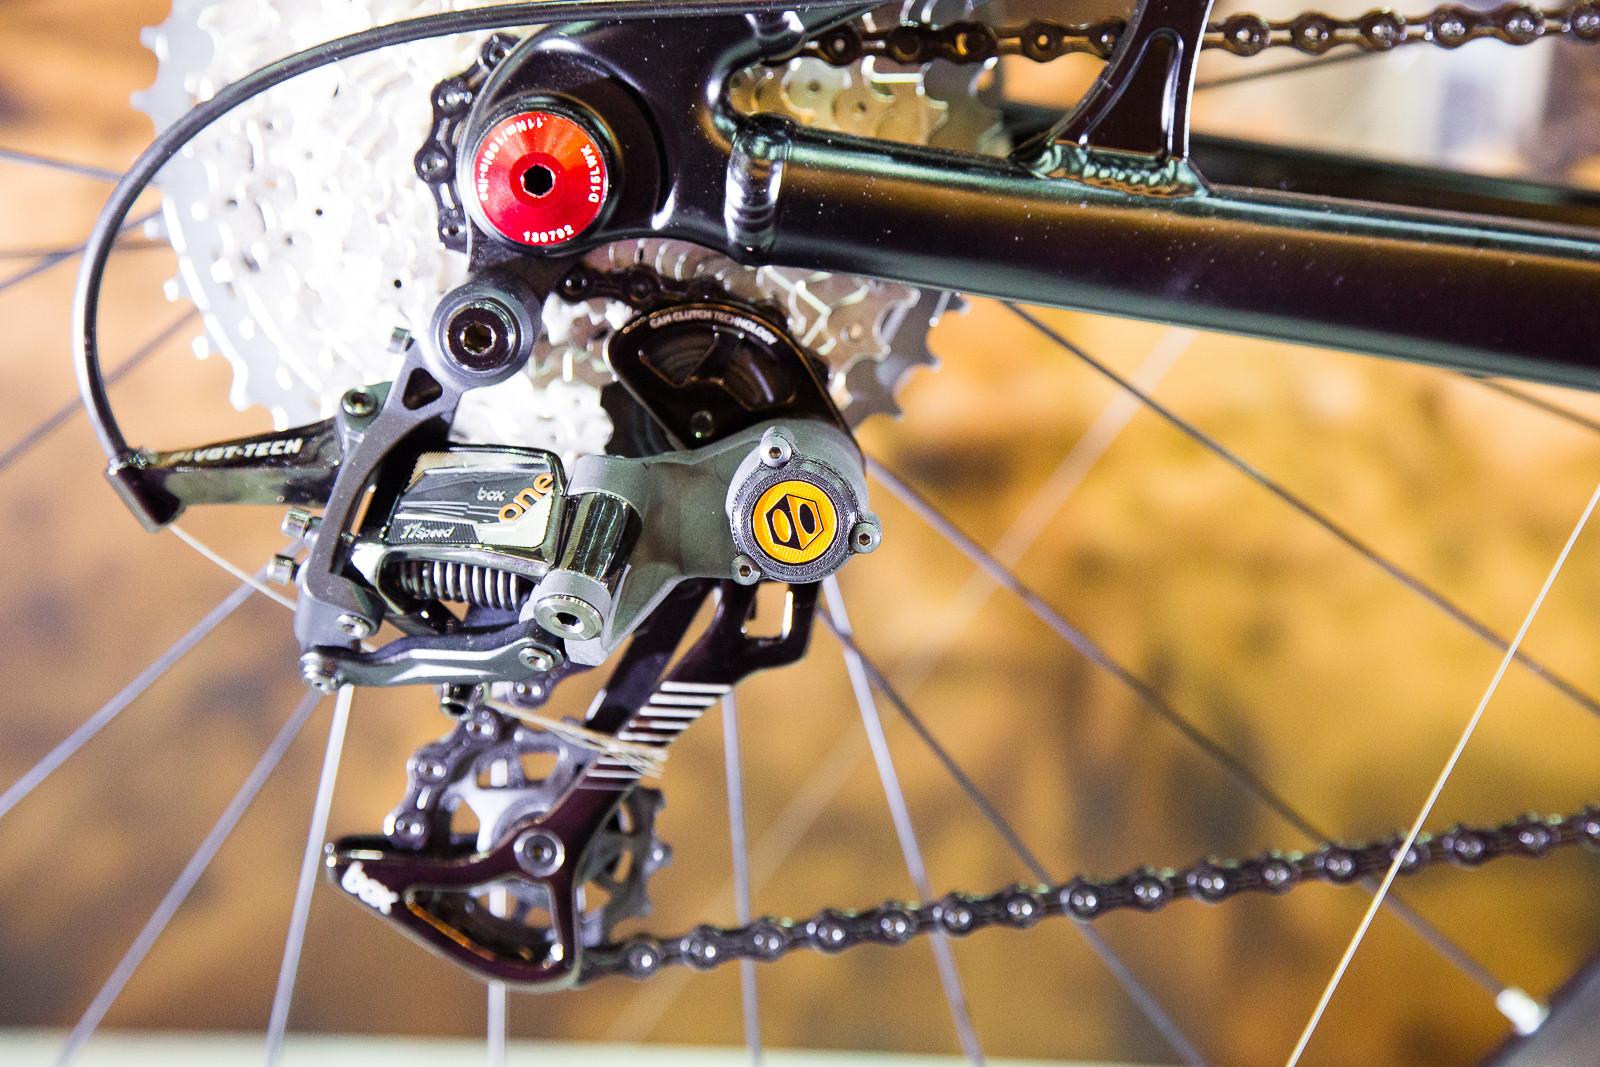 Box Components Rear Derailleur, Shifter and Brakes - 2016 Taipei Bike Show - Mountain Biking Pictures - Vital MTB